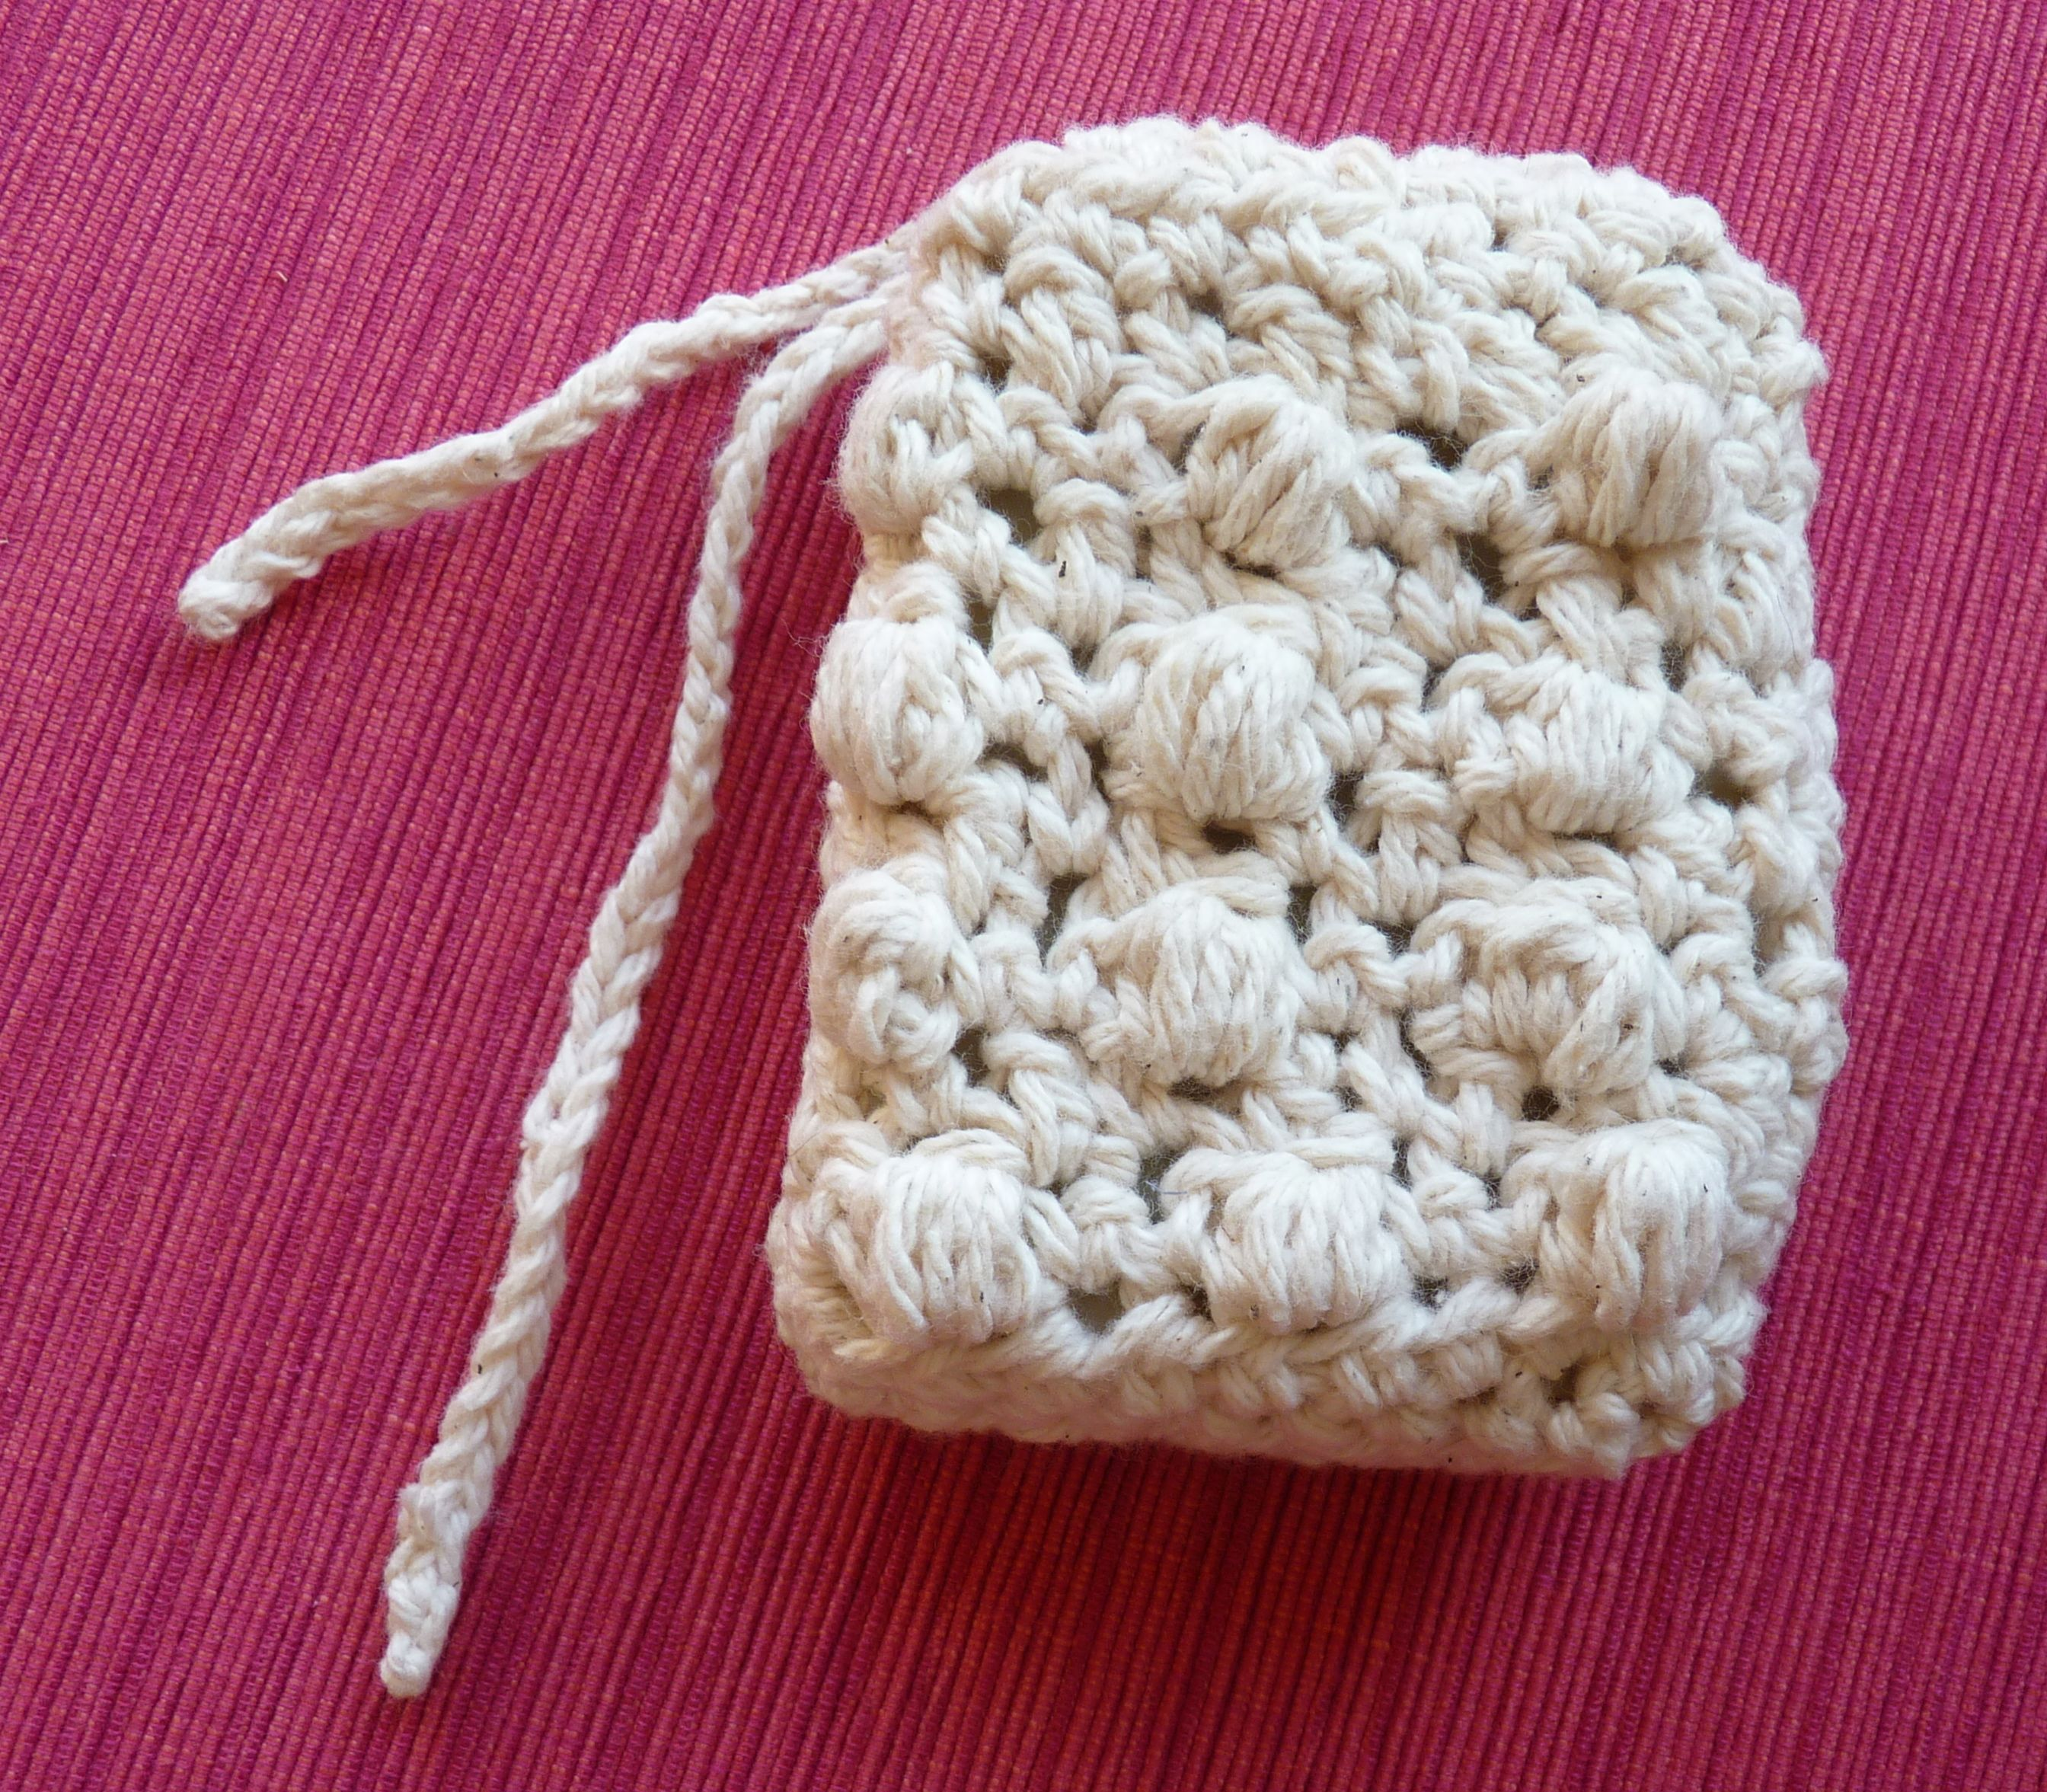 Crochet Soap Saver Bake With Jill